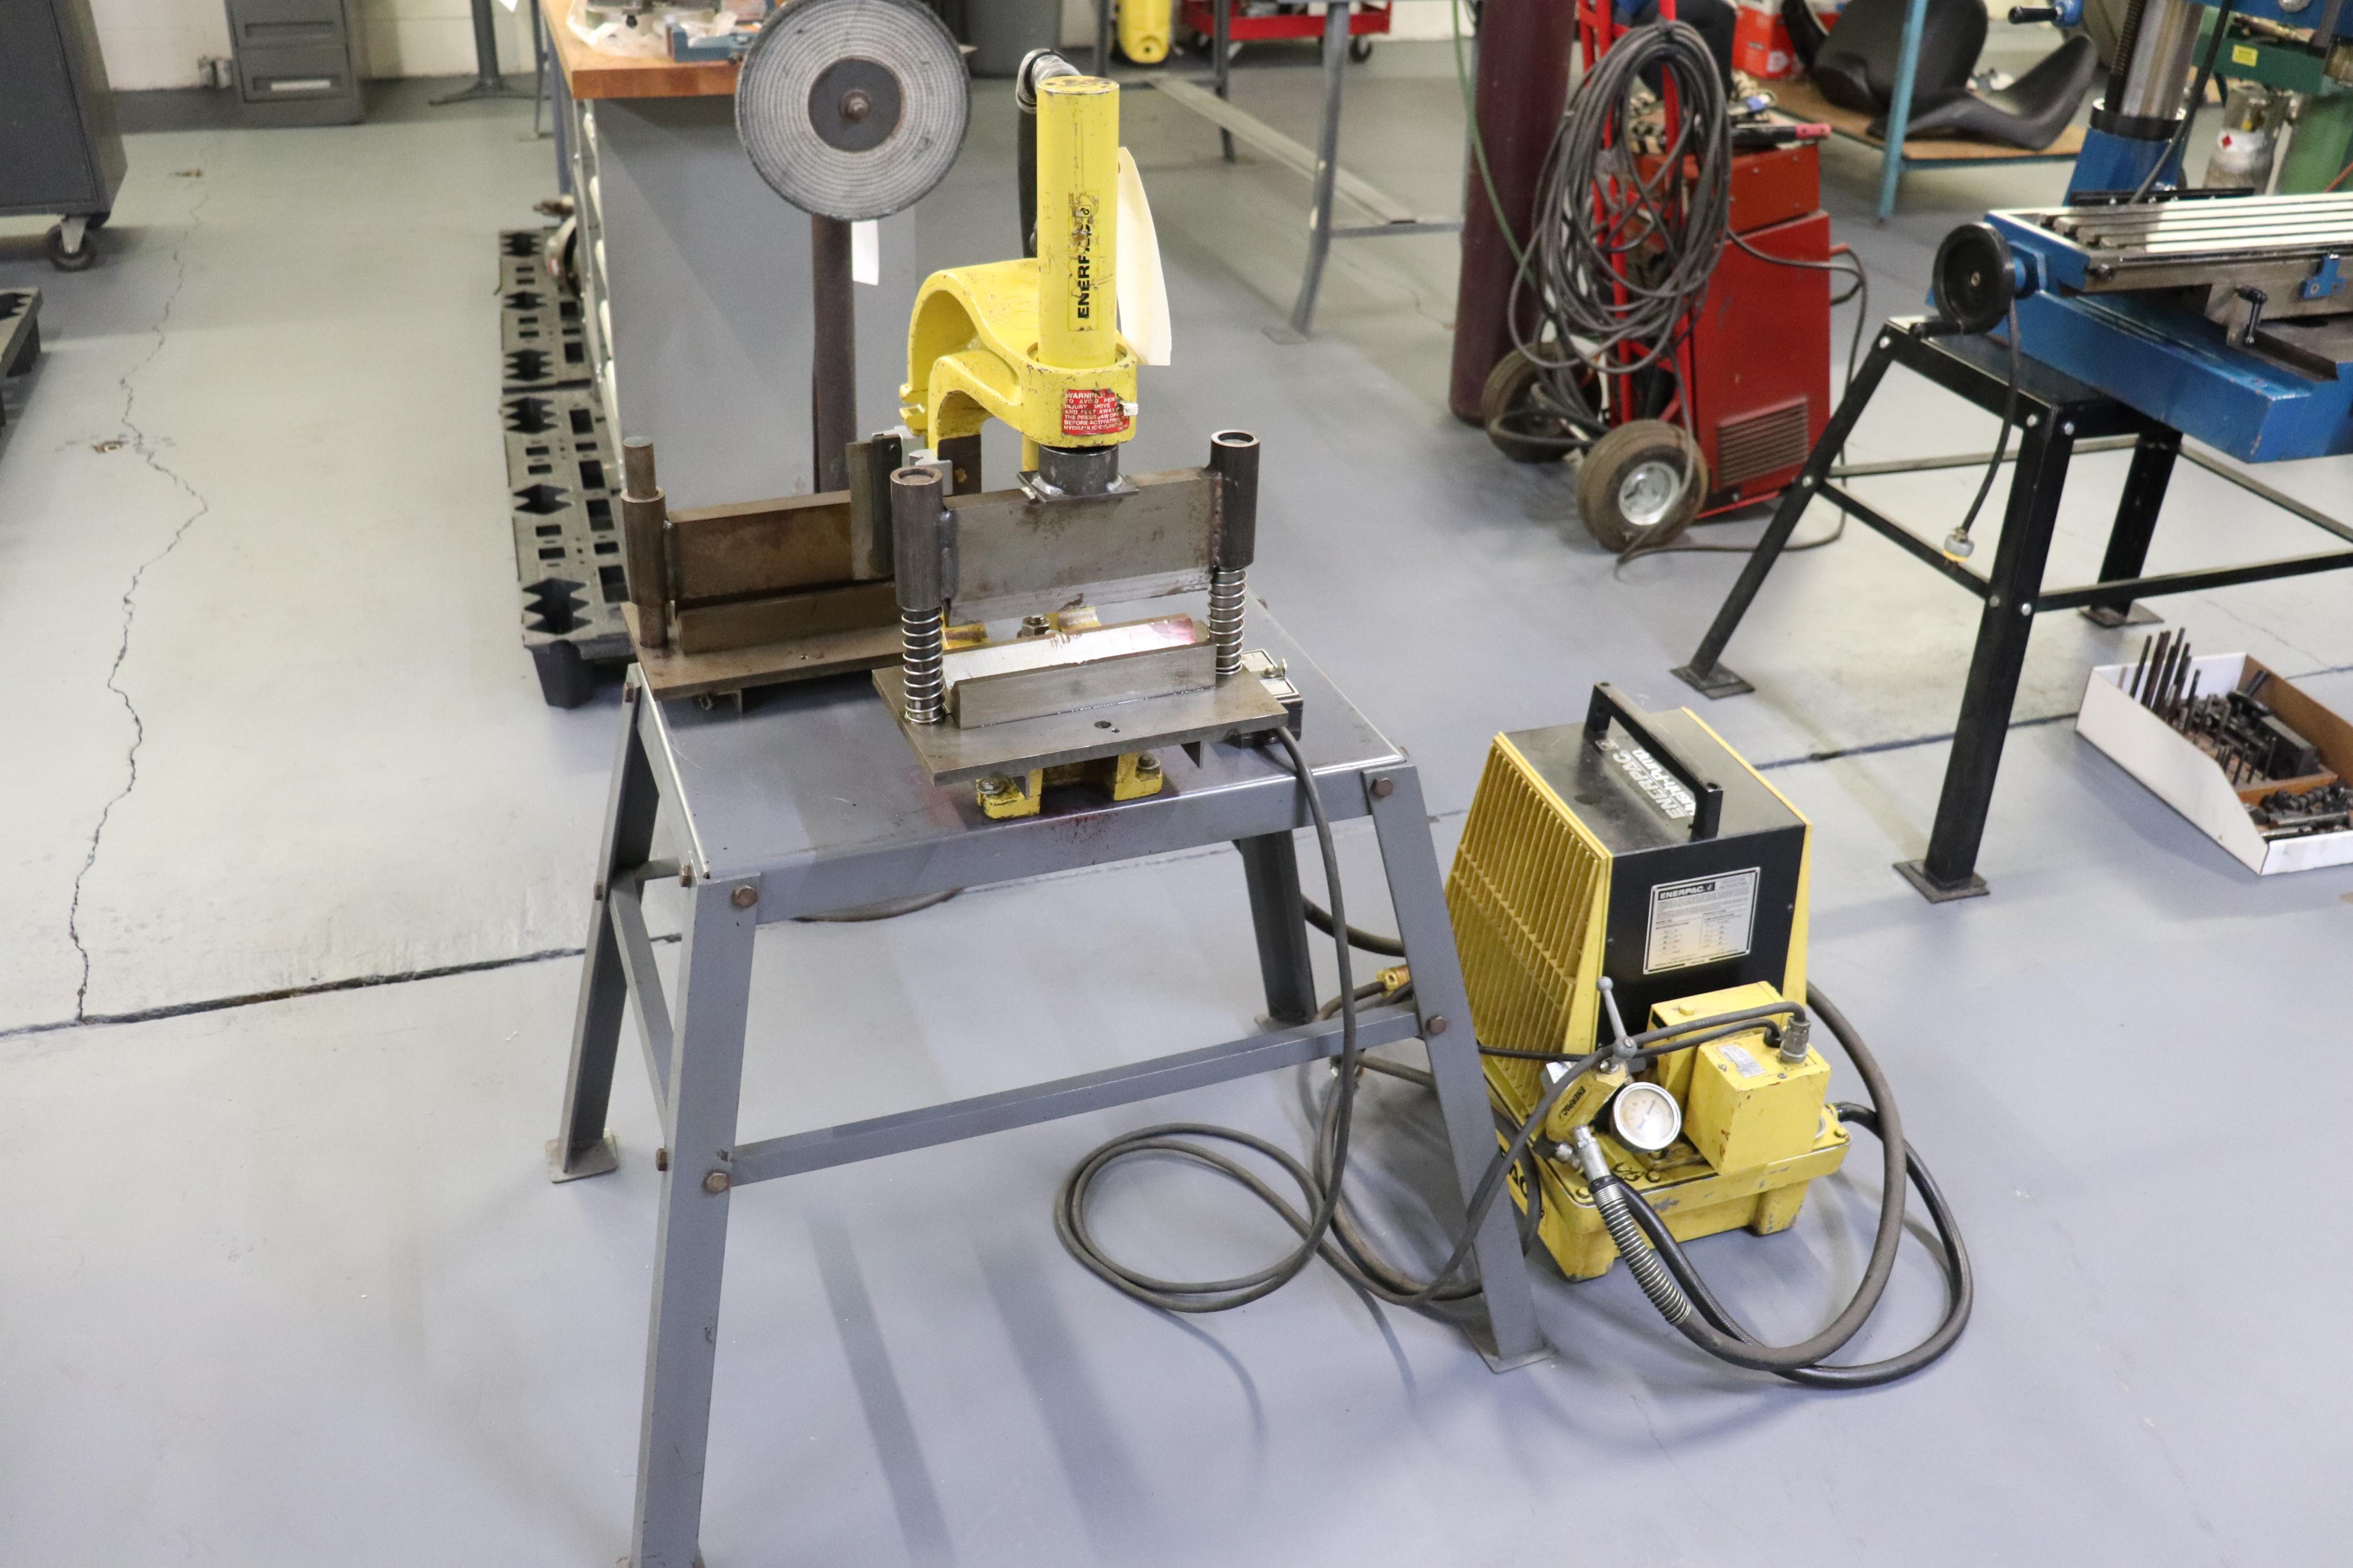 Enerpac Hush pump w/ C frame press